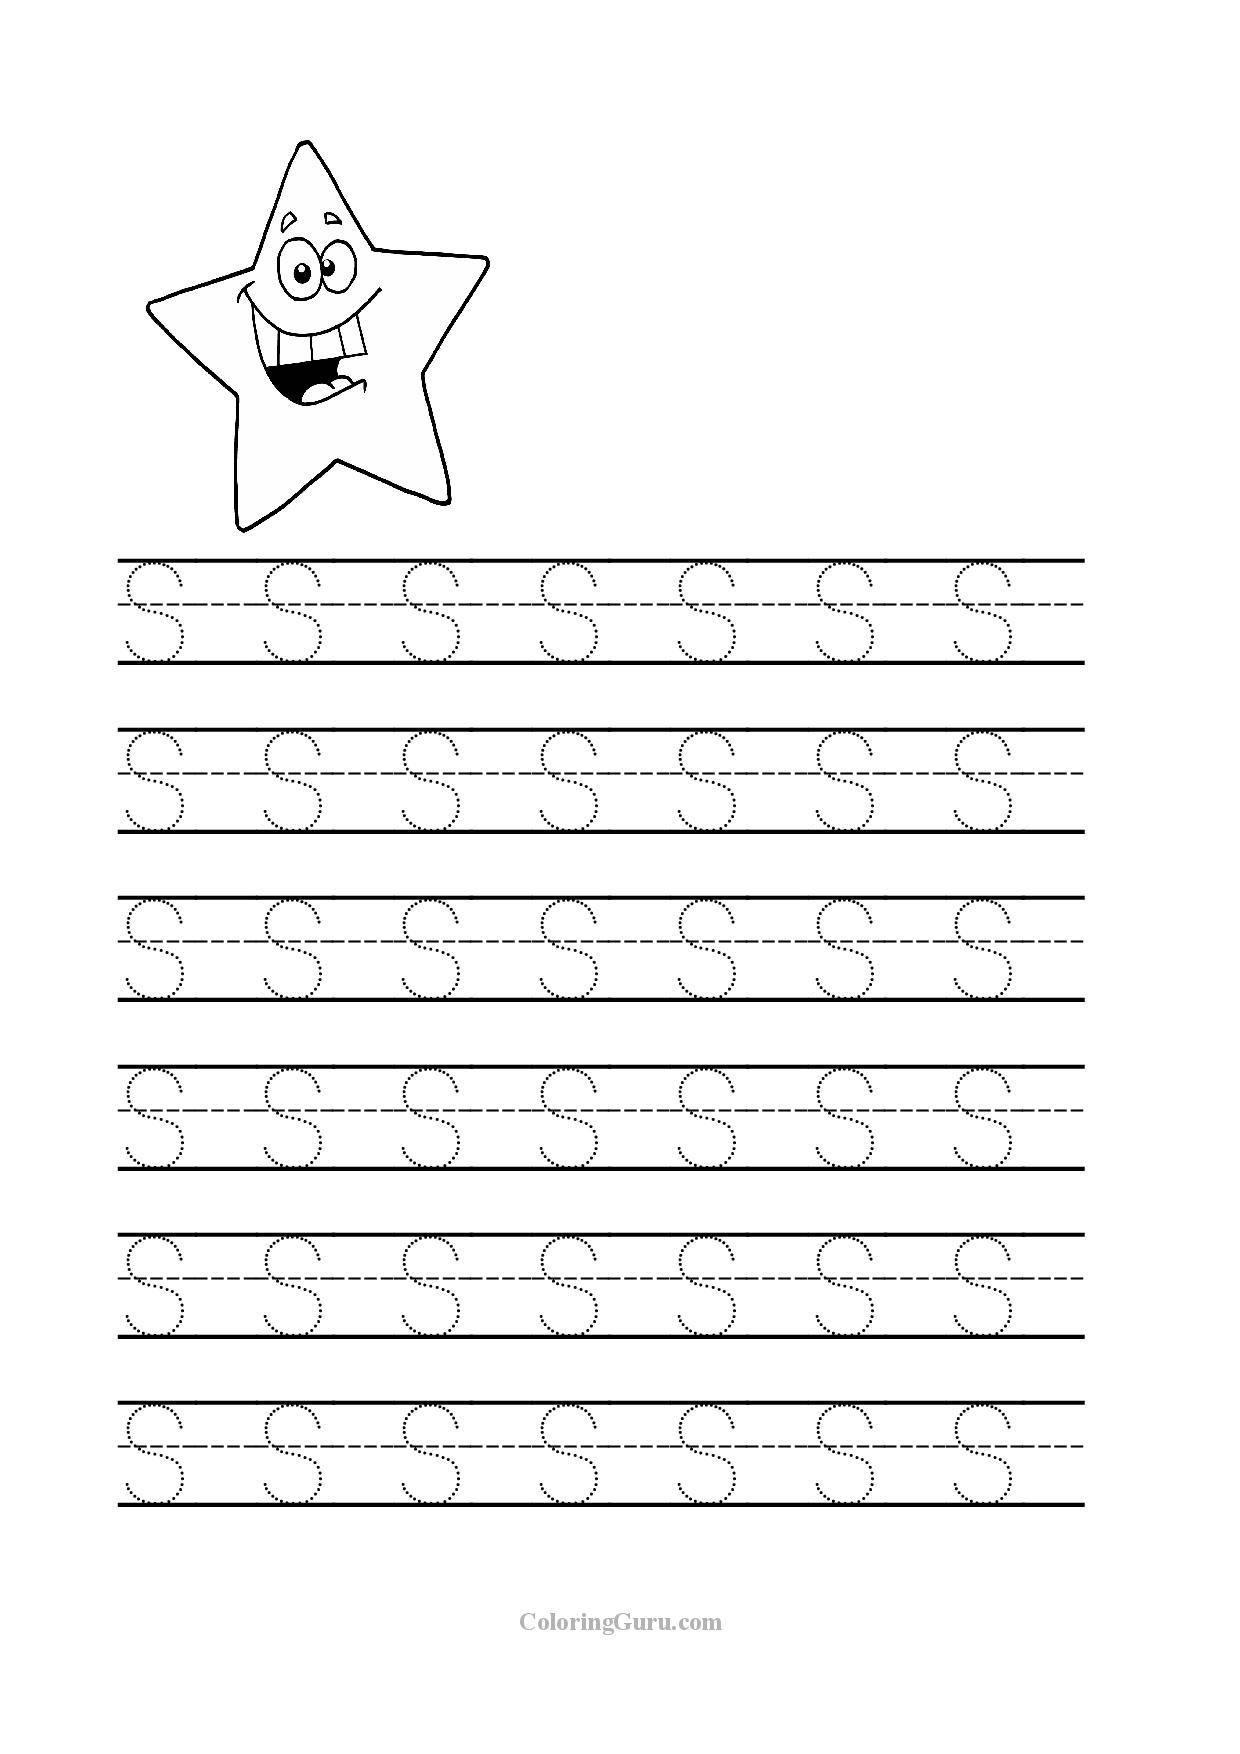 Preschool Tracing Letters Free Worksheets